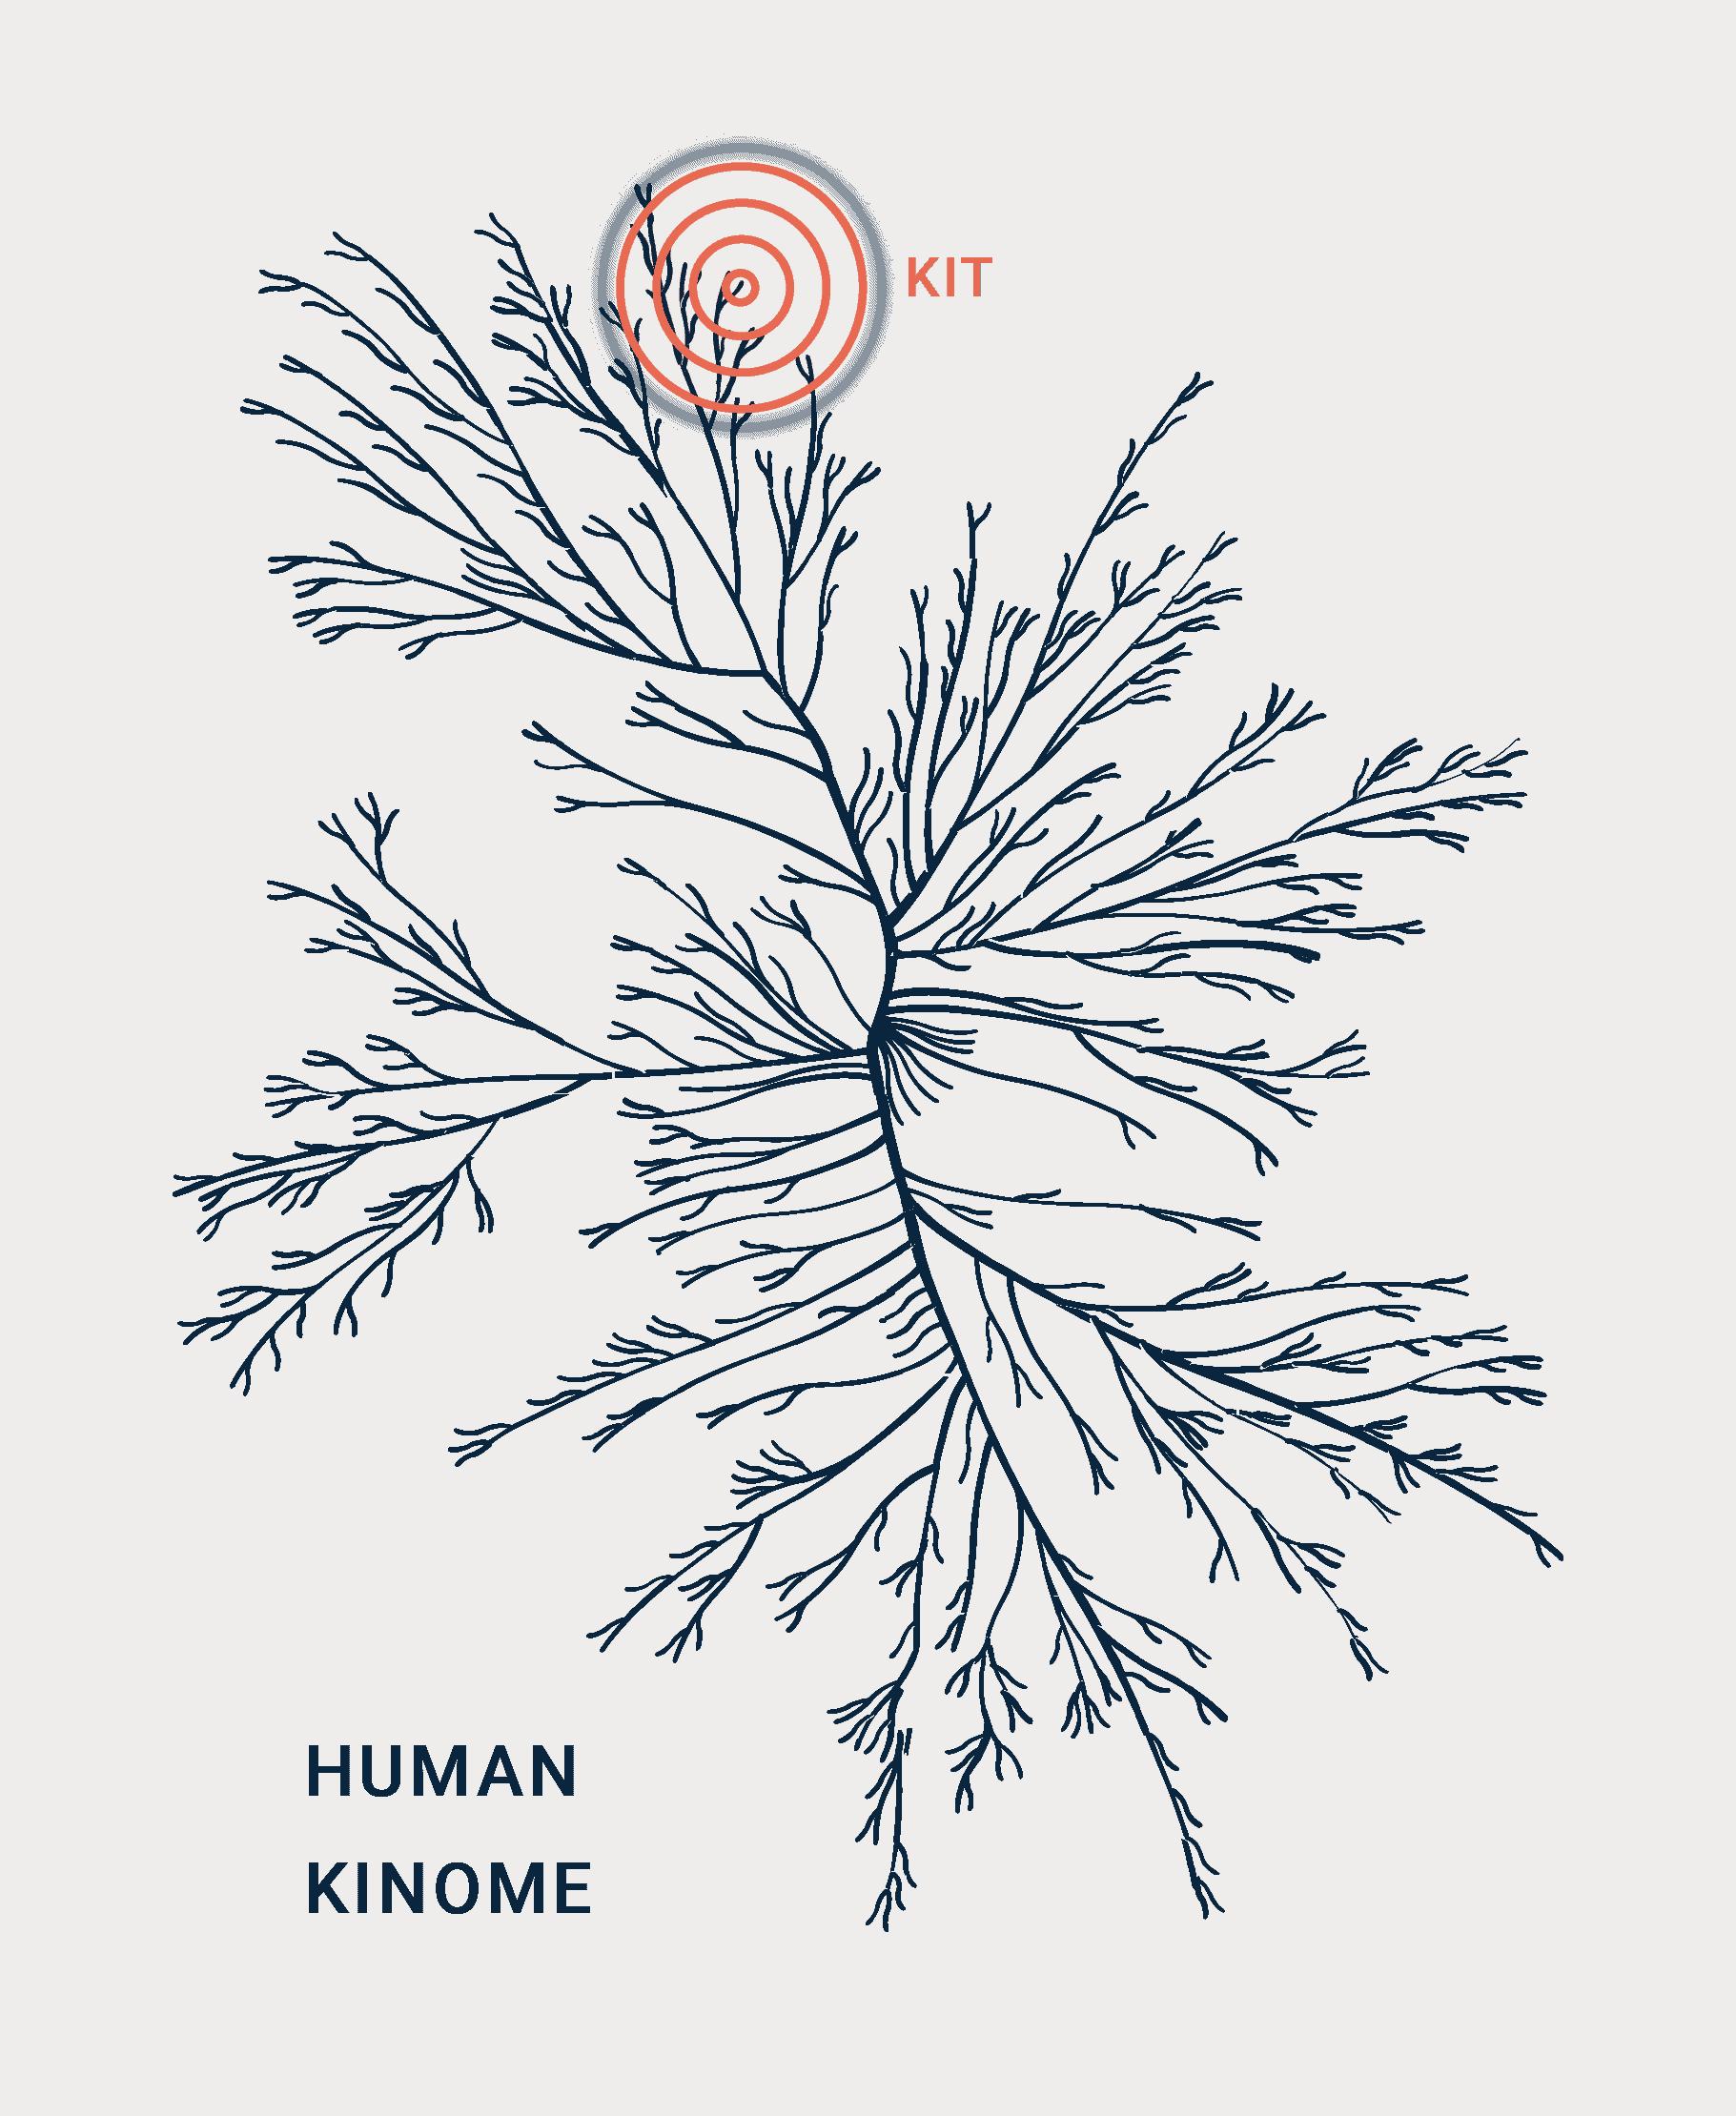 Kinome graphic